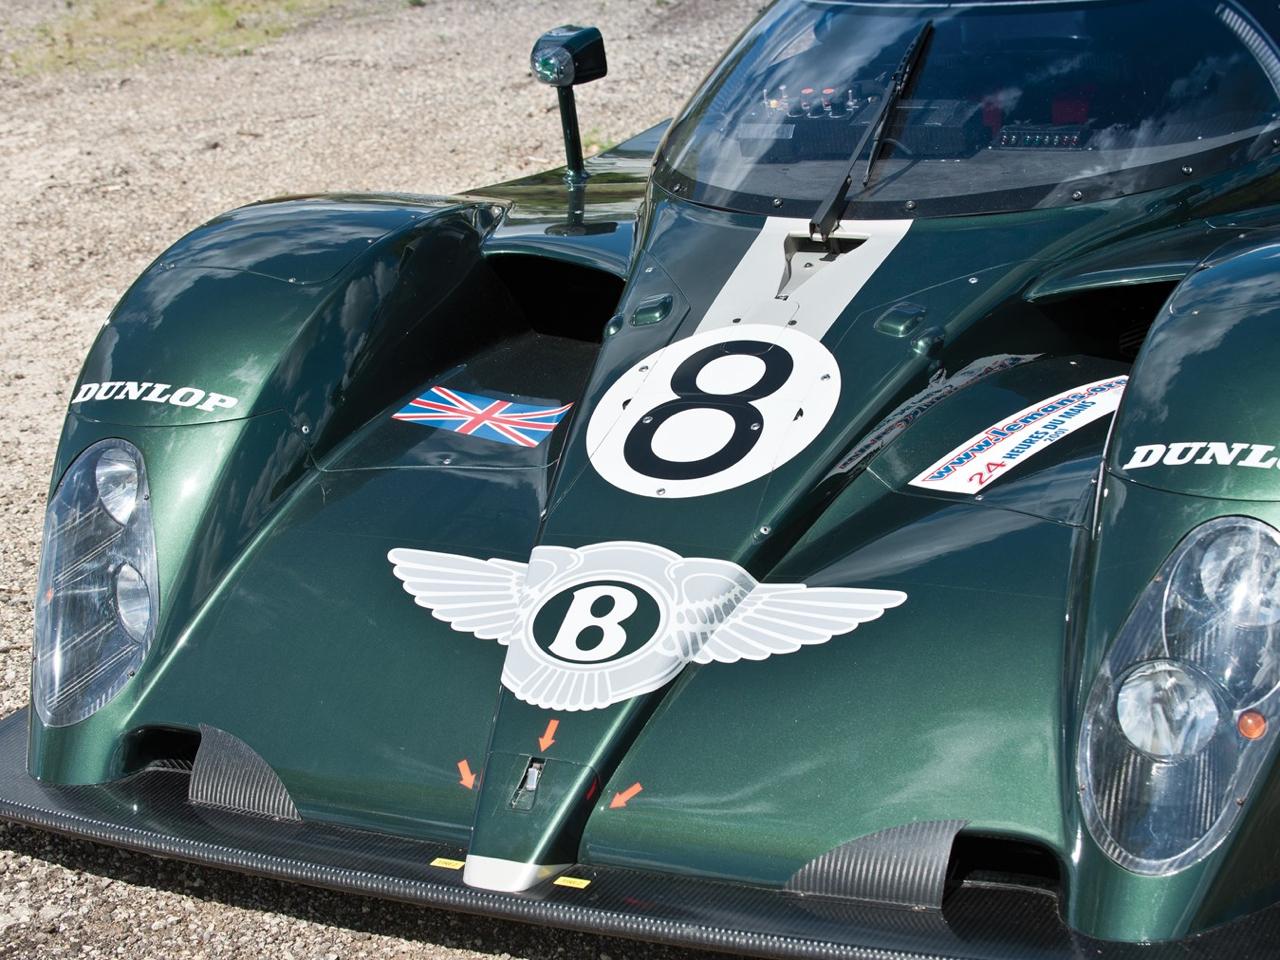 Engine Sound : Bentley Speed 8 - 3 années pour 1 victoire ! 5